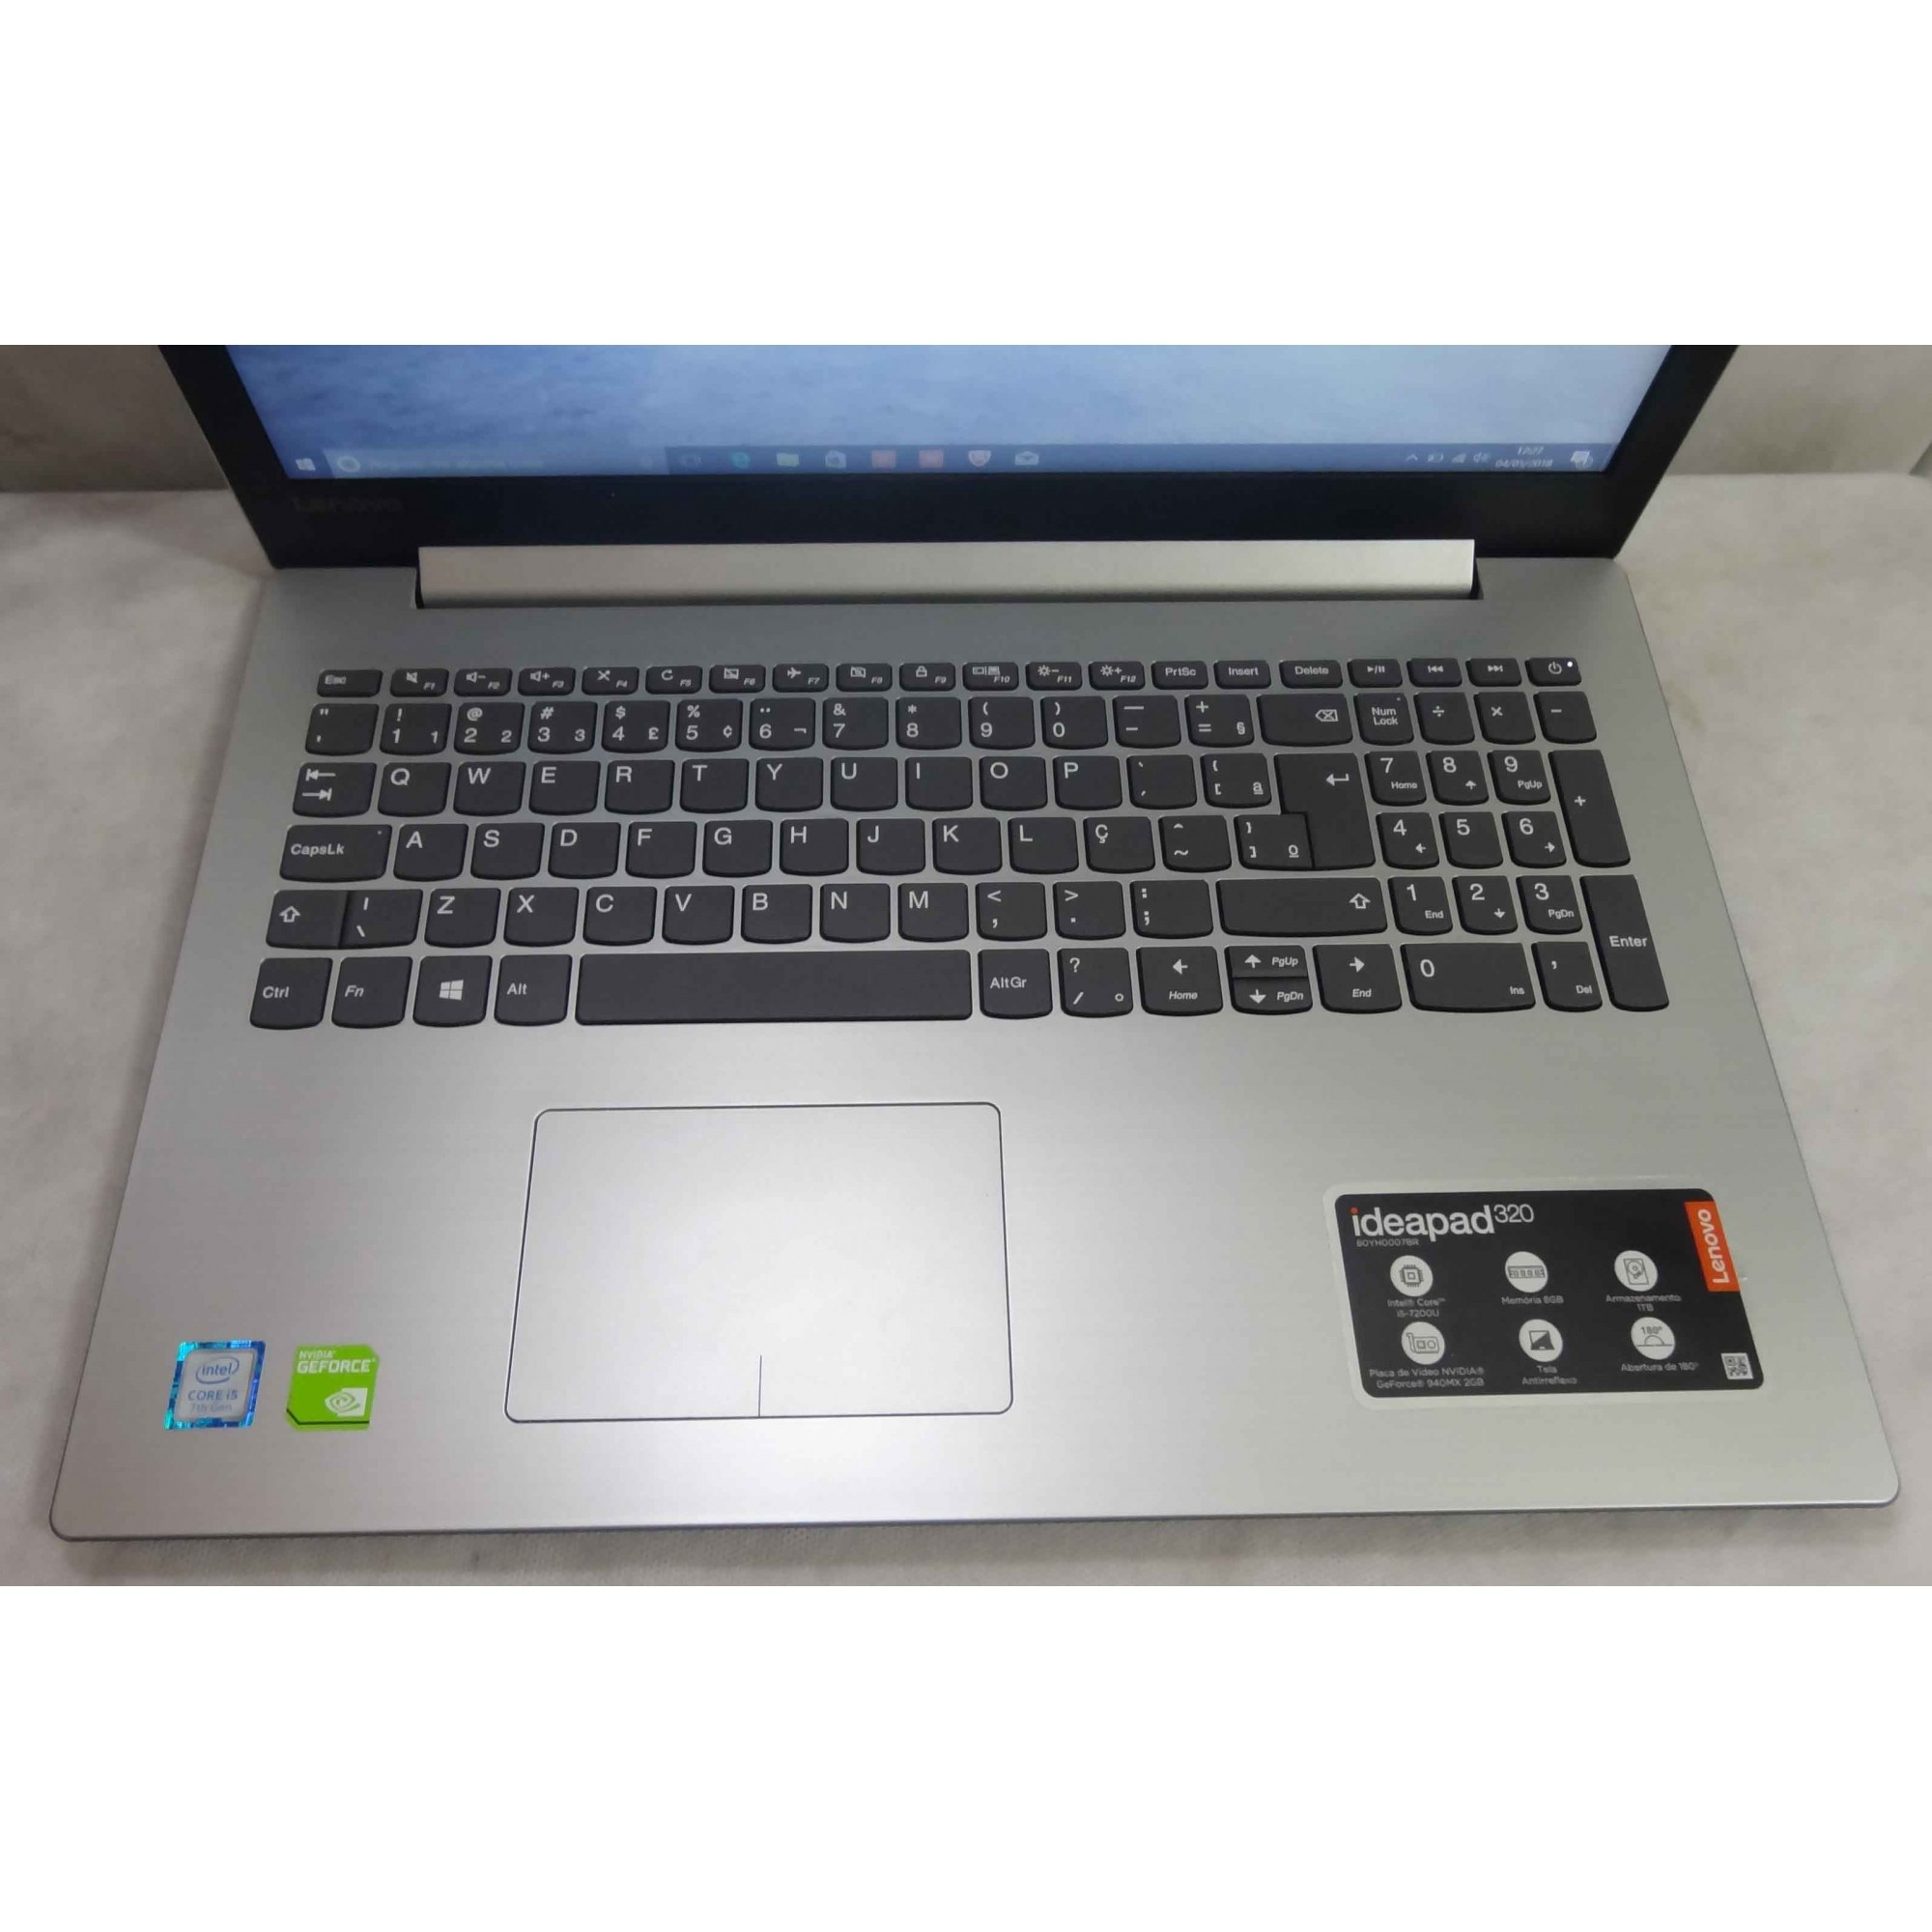 Notebook Lenovo ideapad 320 Intel Core i5 2.7GHz 8GB HD-1TB - (2GB Dedicada) + Alphanumérico